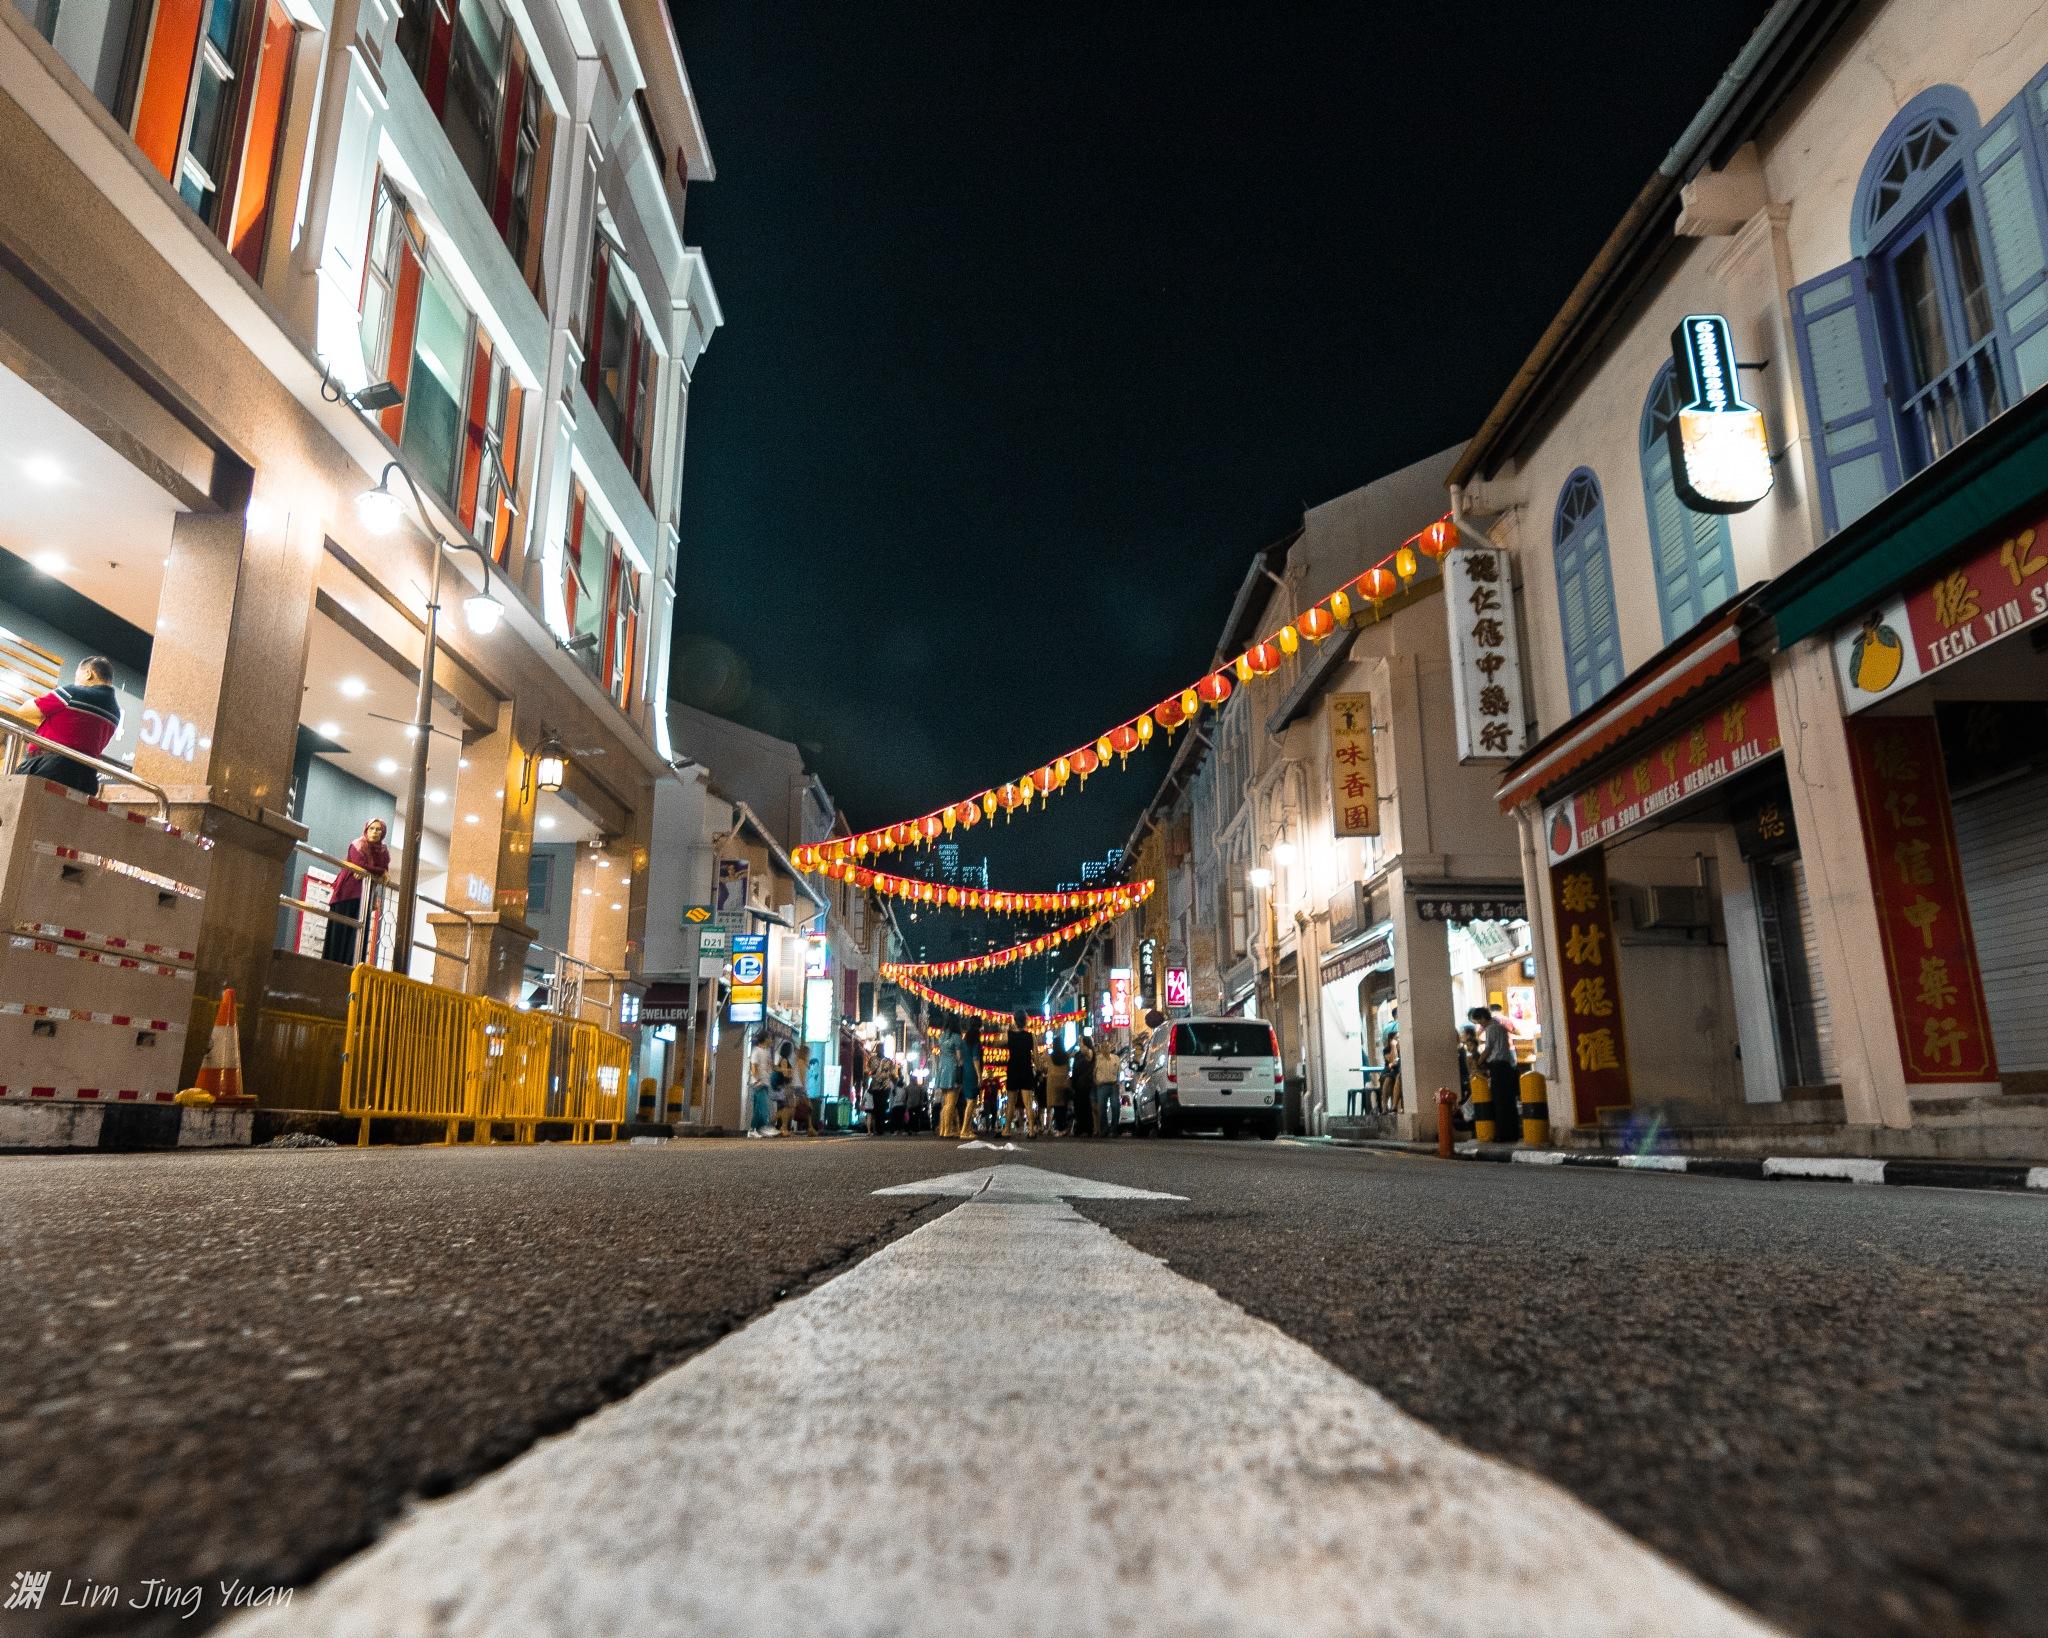 lights will guide you by Lim Jing Yuan